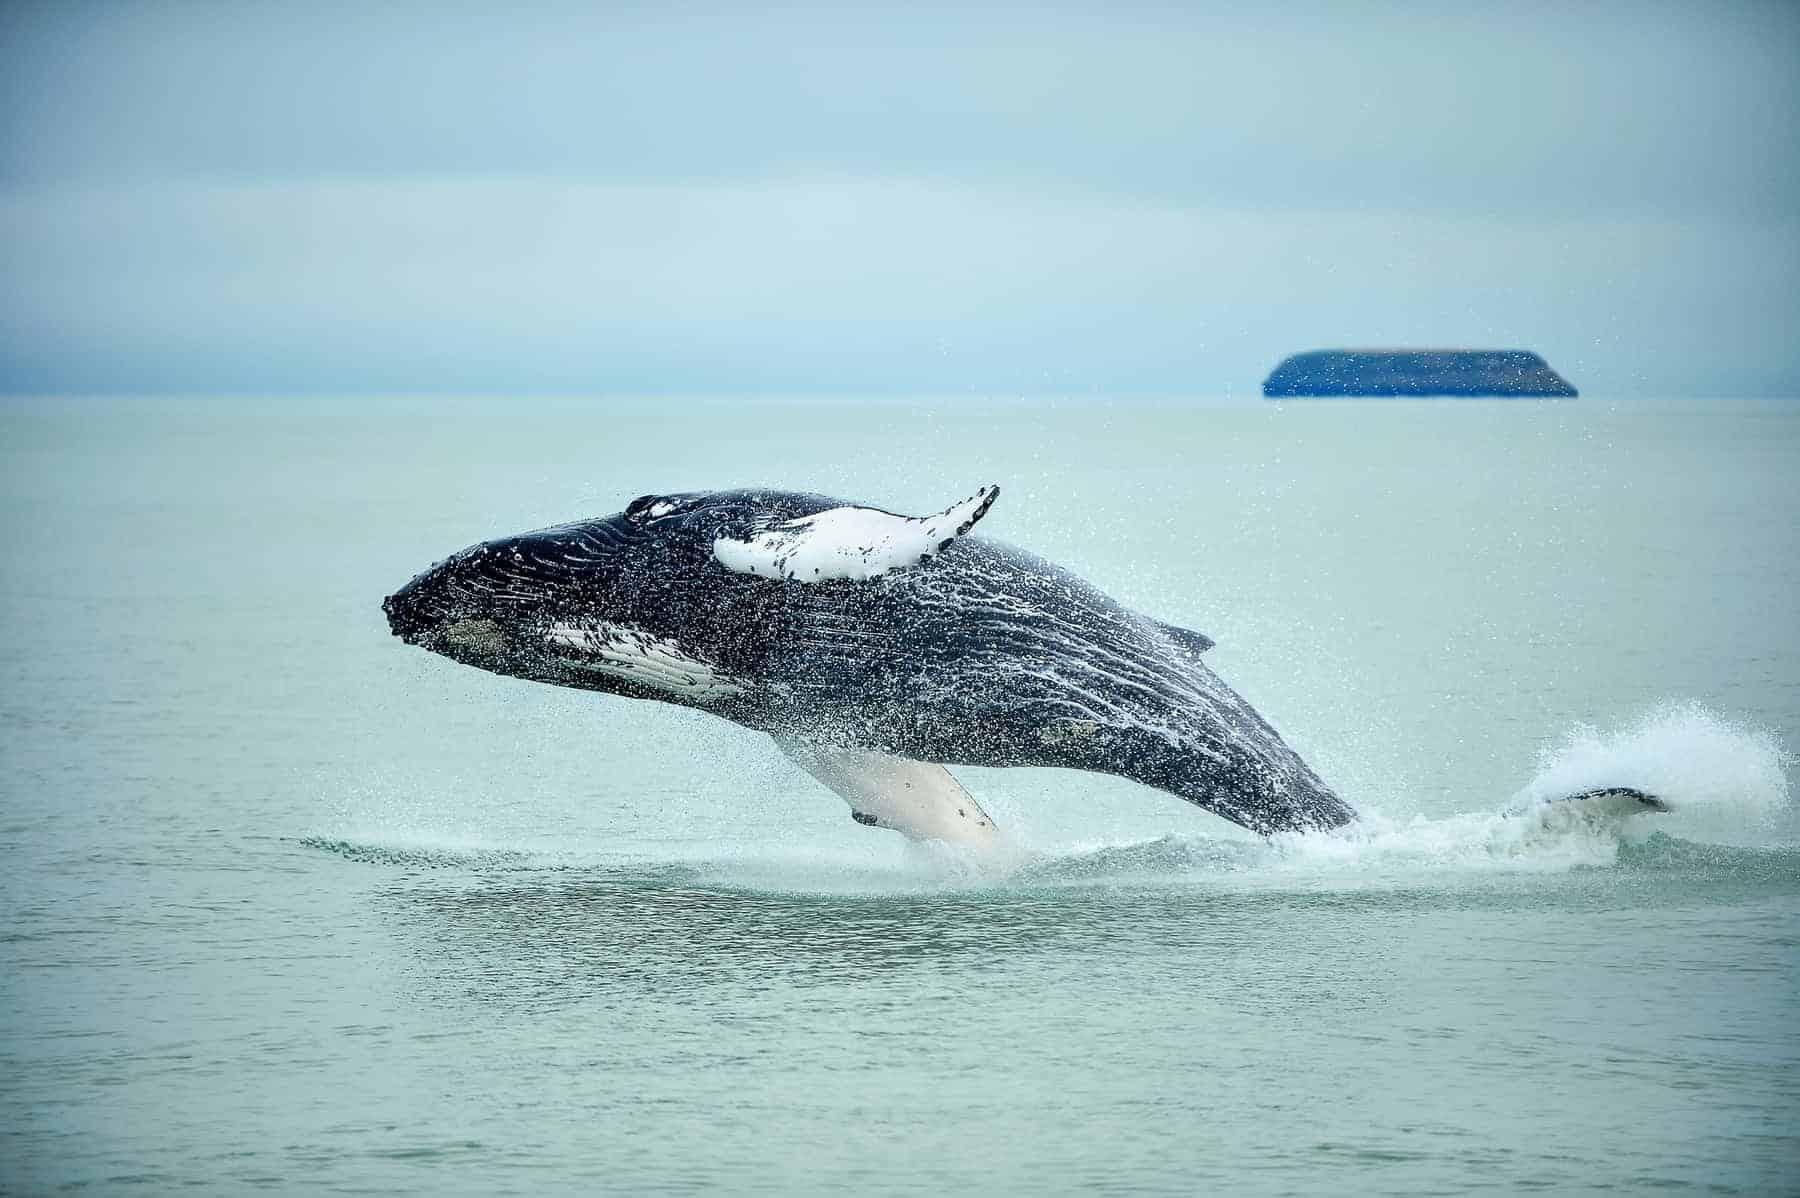 Humpback Whale Megaptera novaeangliae breaching near Husavik City in Iceland